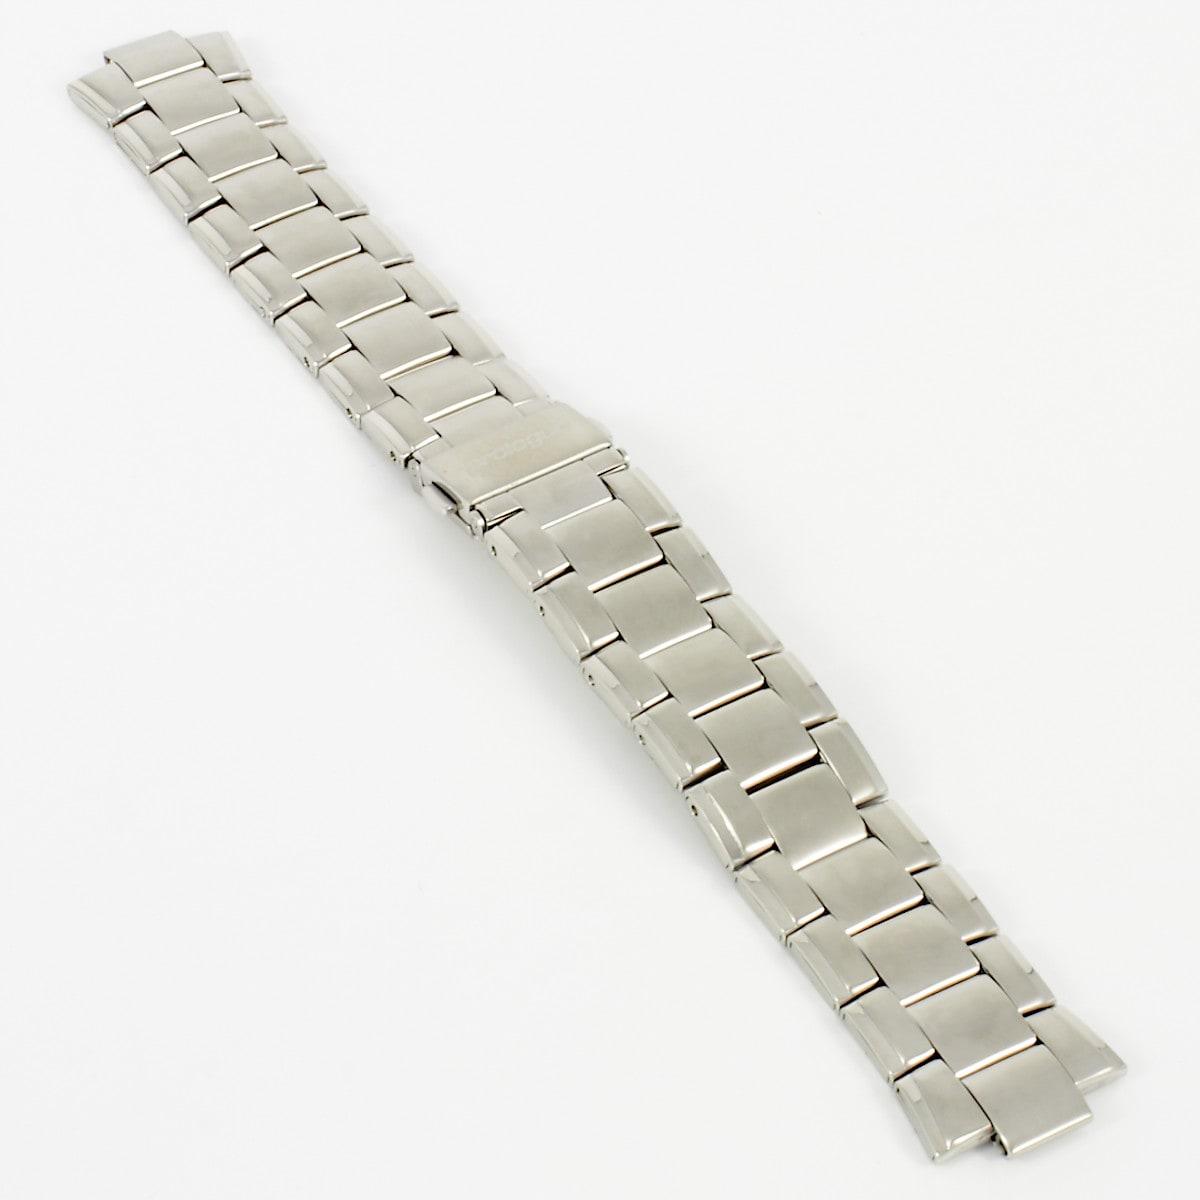 Steel link